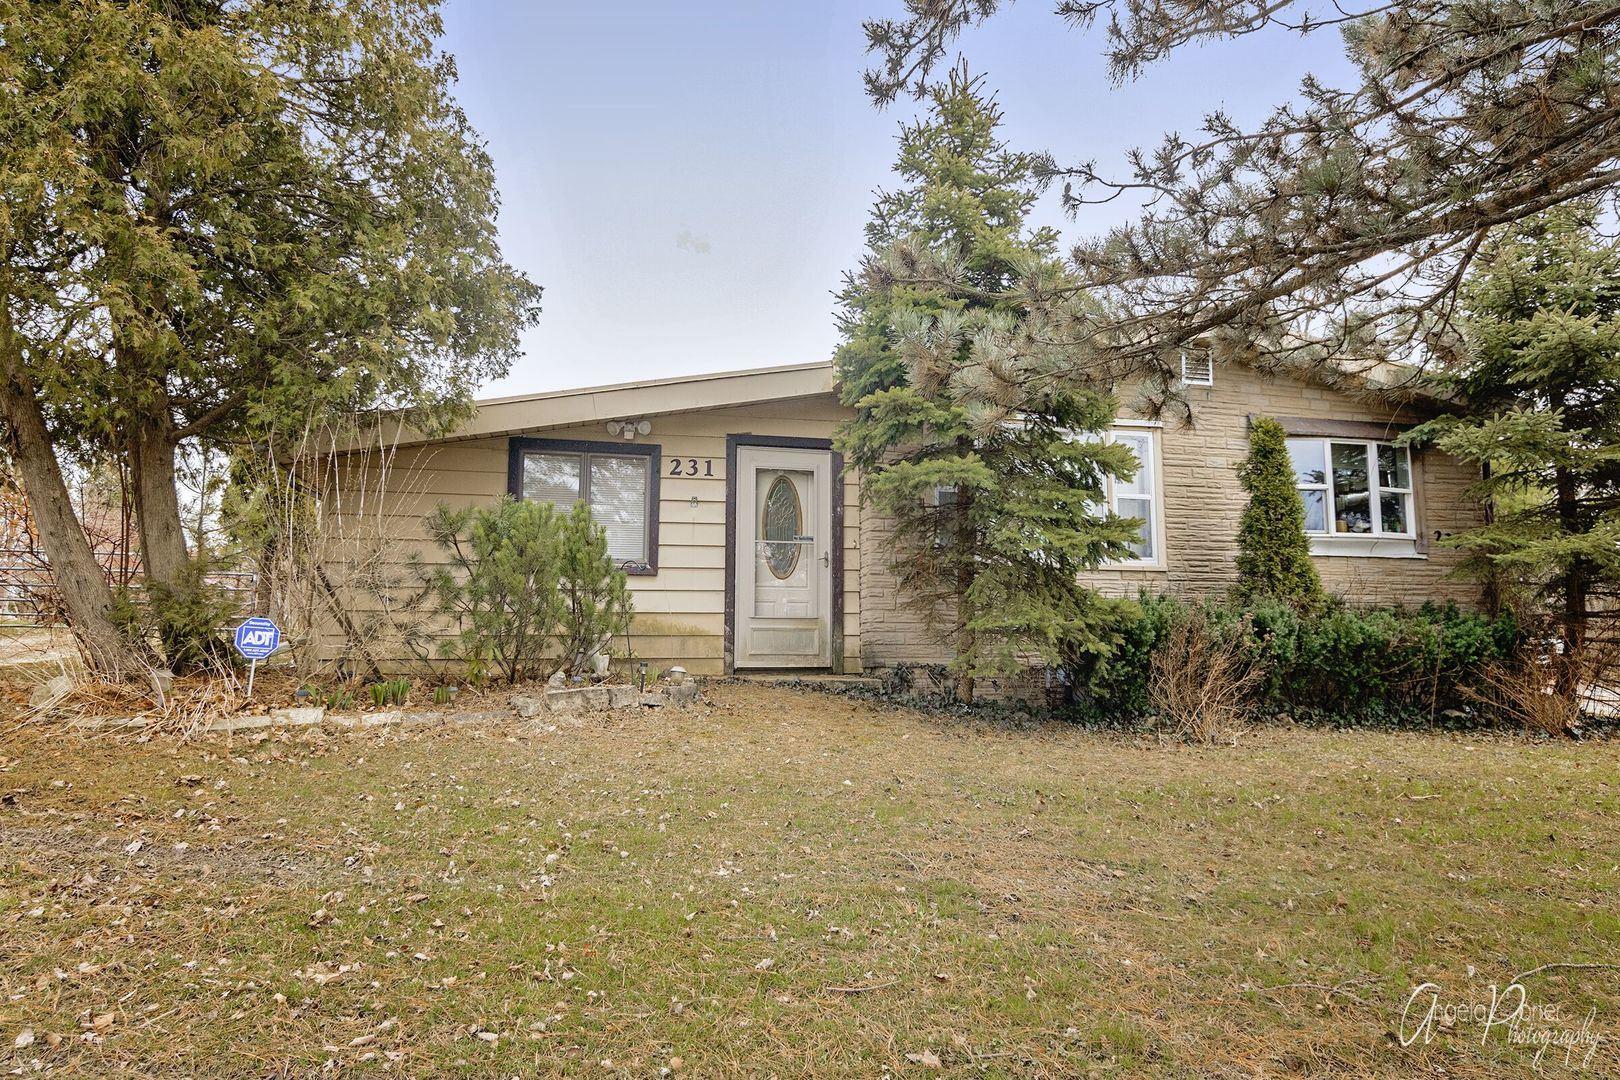 231 Briar Lane, Lindenhurst, IL 60046 - #: 10685724